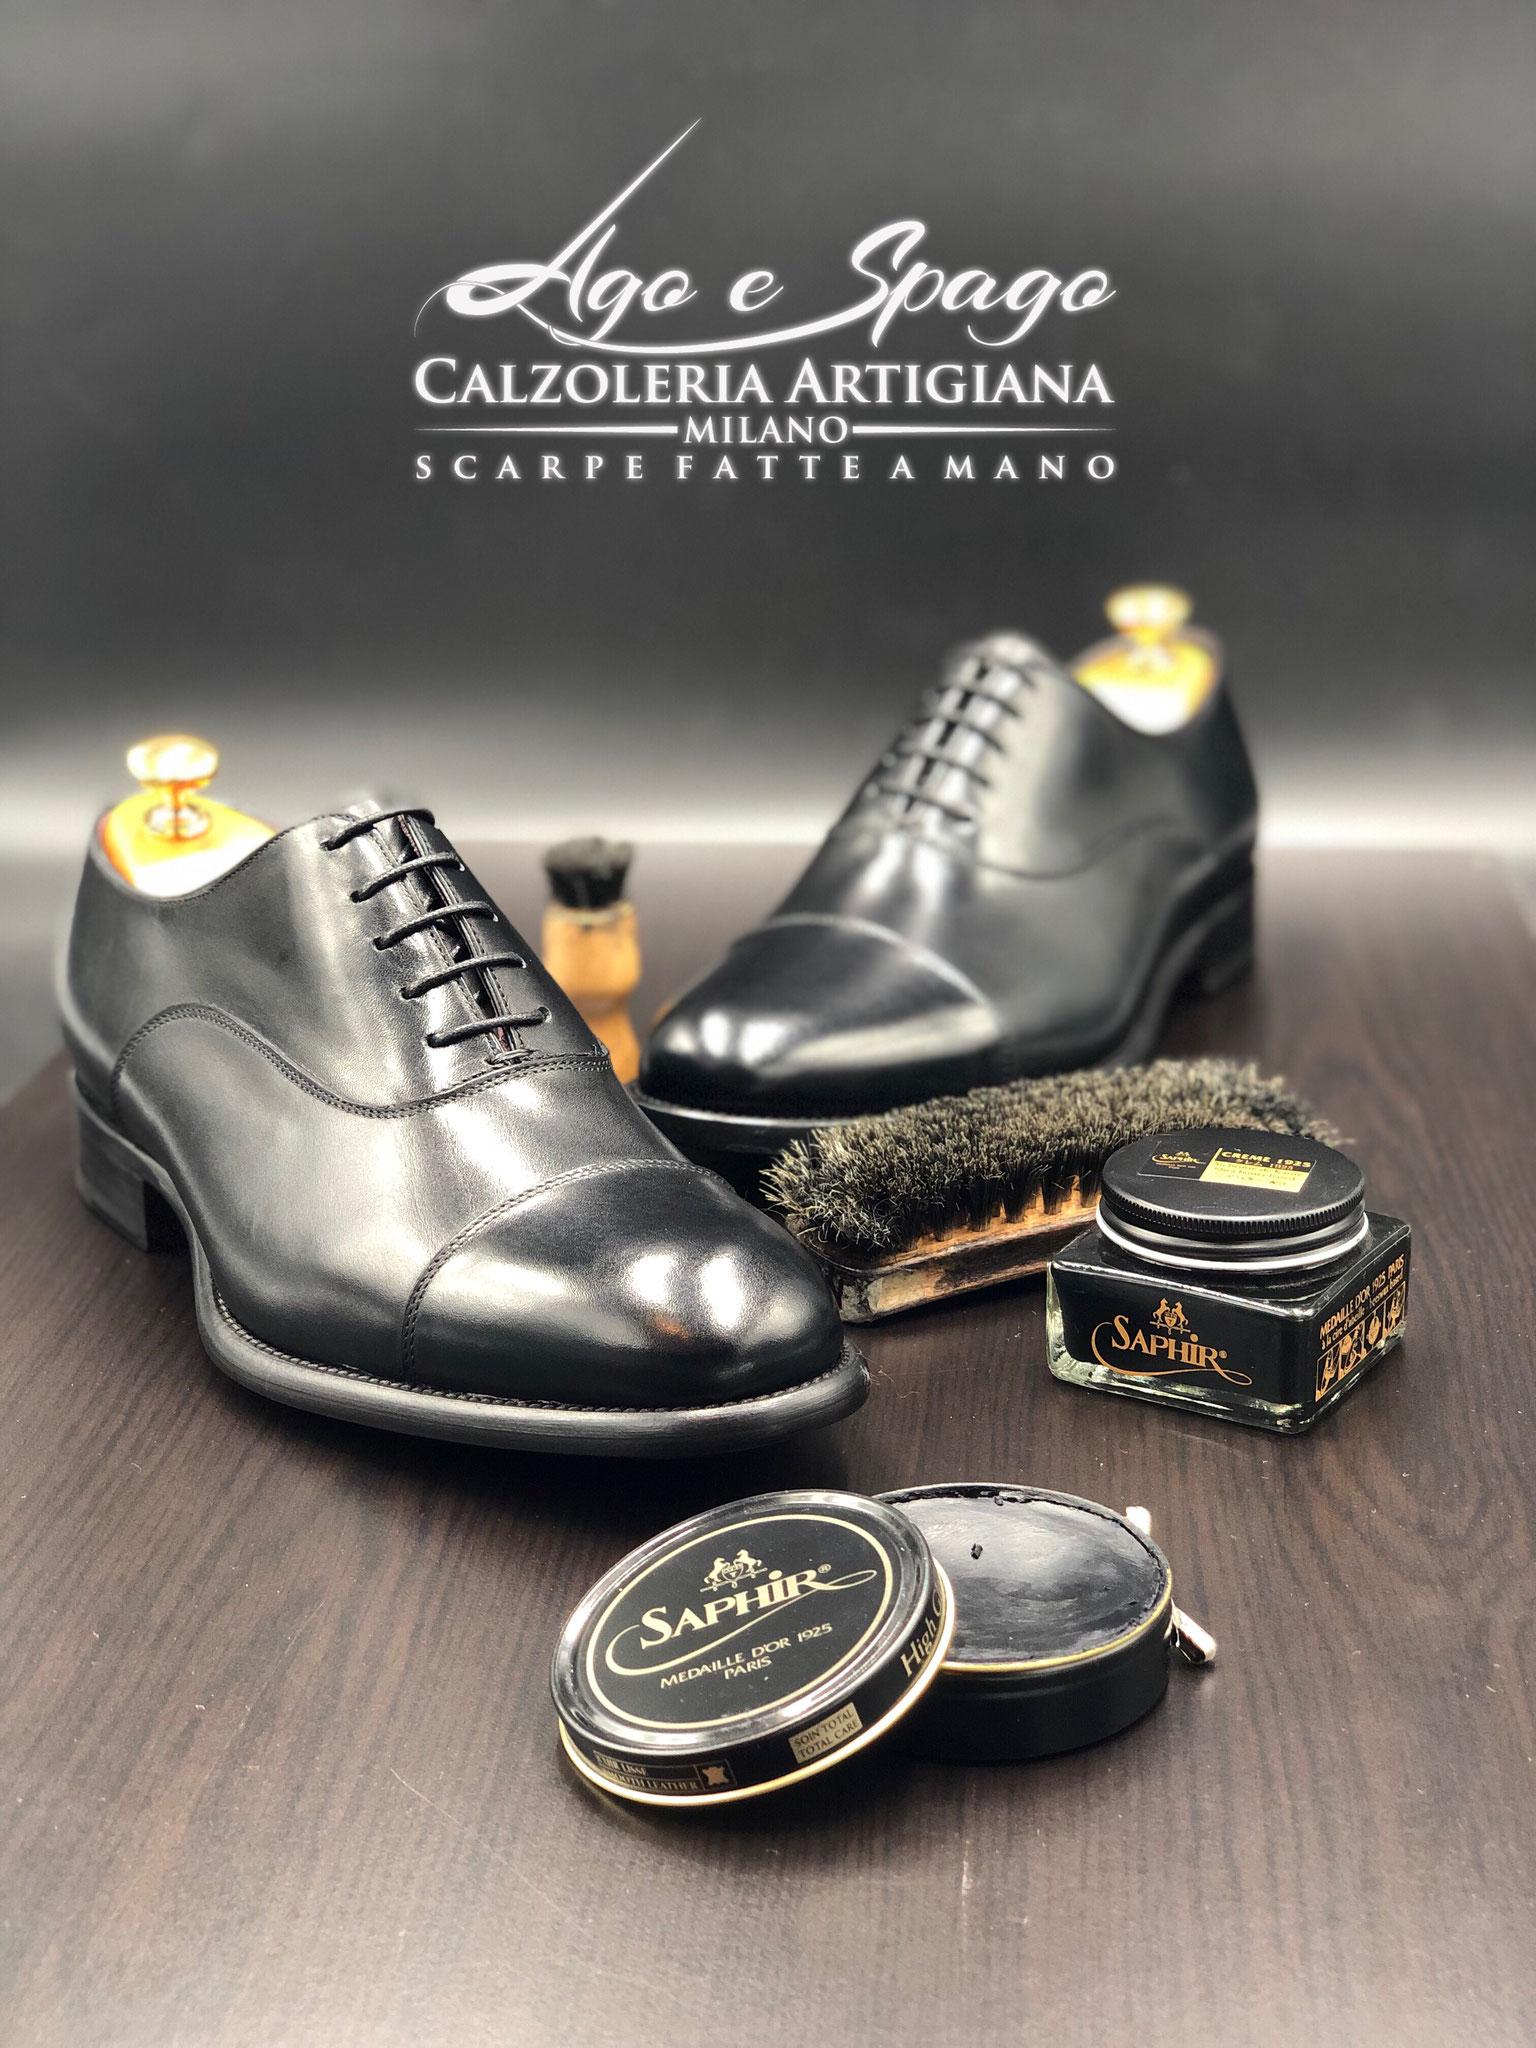 factory price 47949 d4d6d Scarpe artigianali fatte a mano Milano - Ago e Spago Milano ...